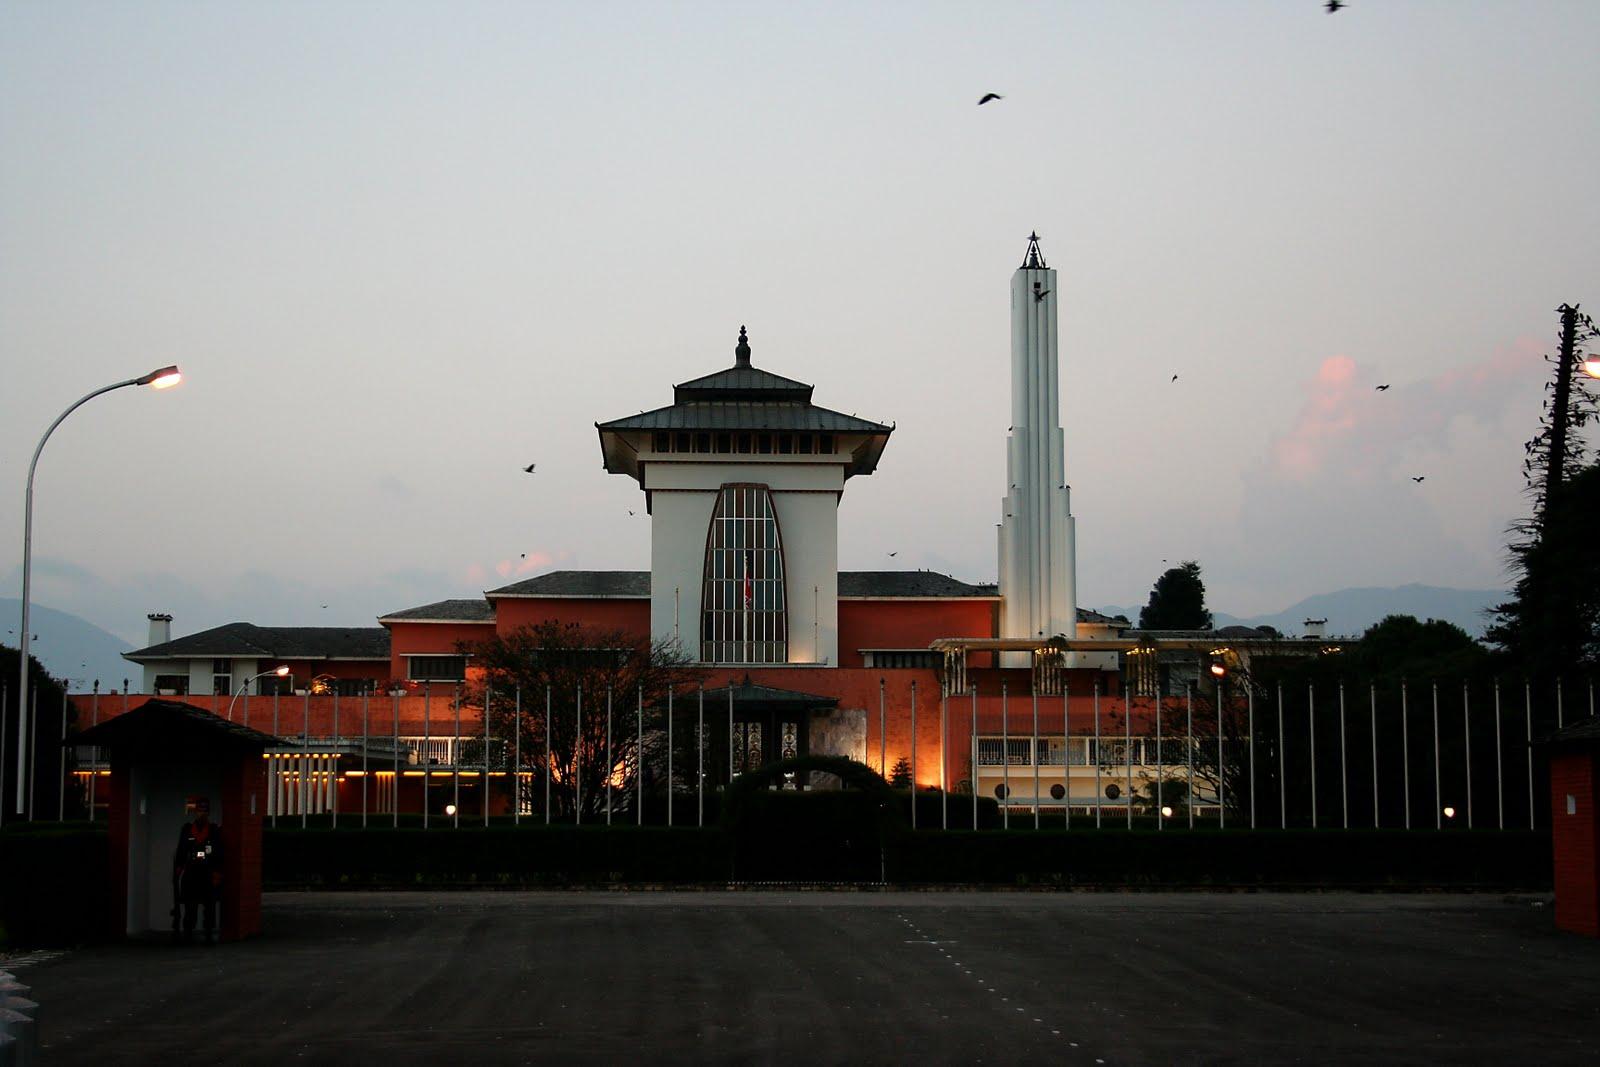 Kathmandu Valley (काठमांडौ)